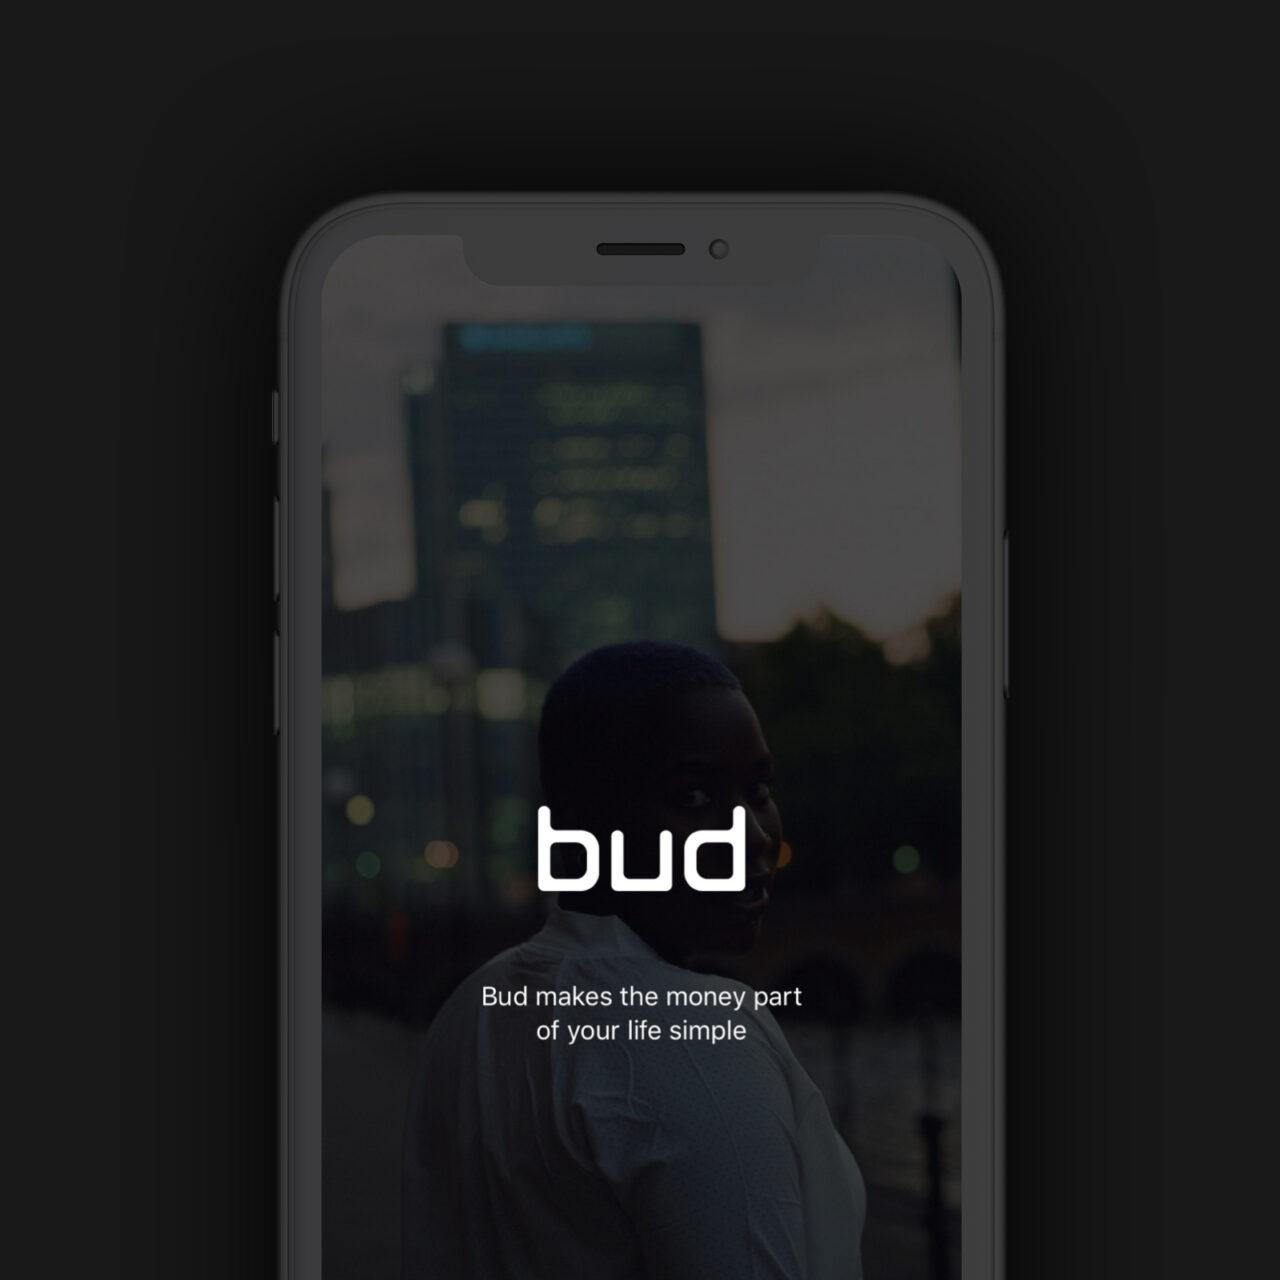 01 The Bud App